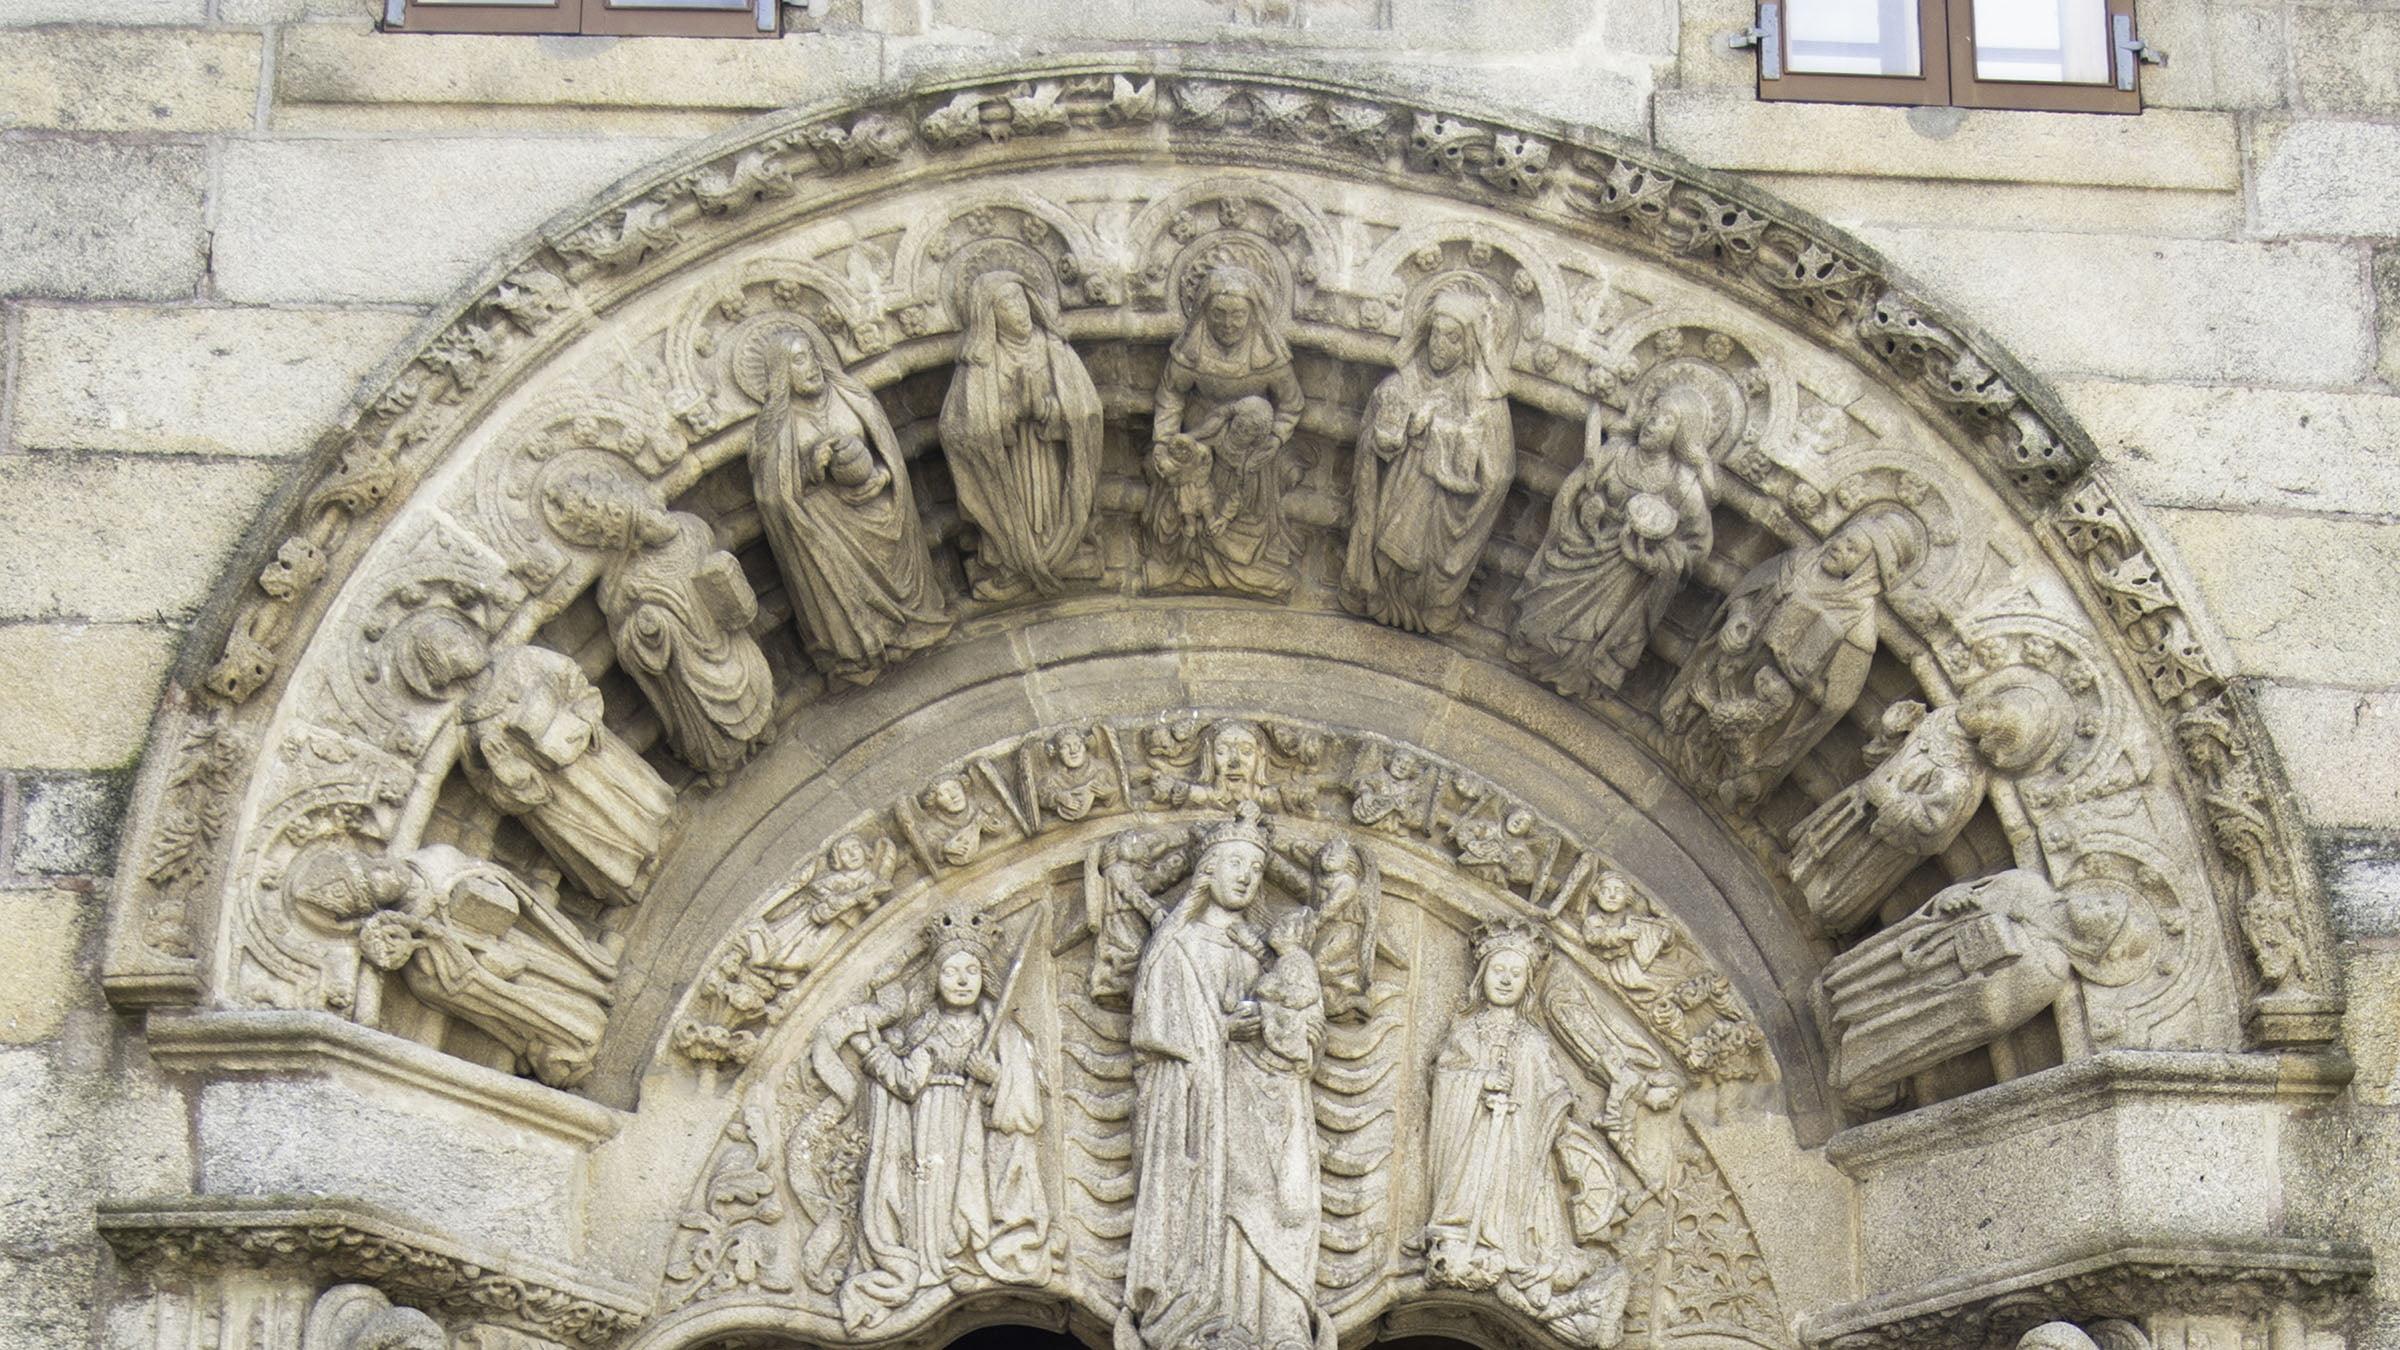 Palacio de San Jerónimo